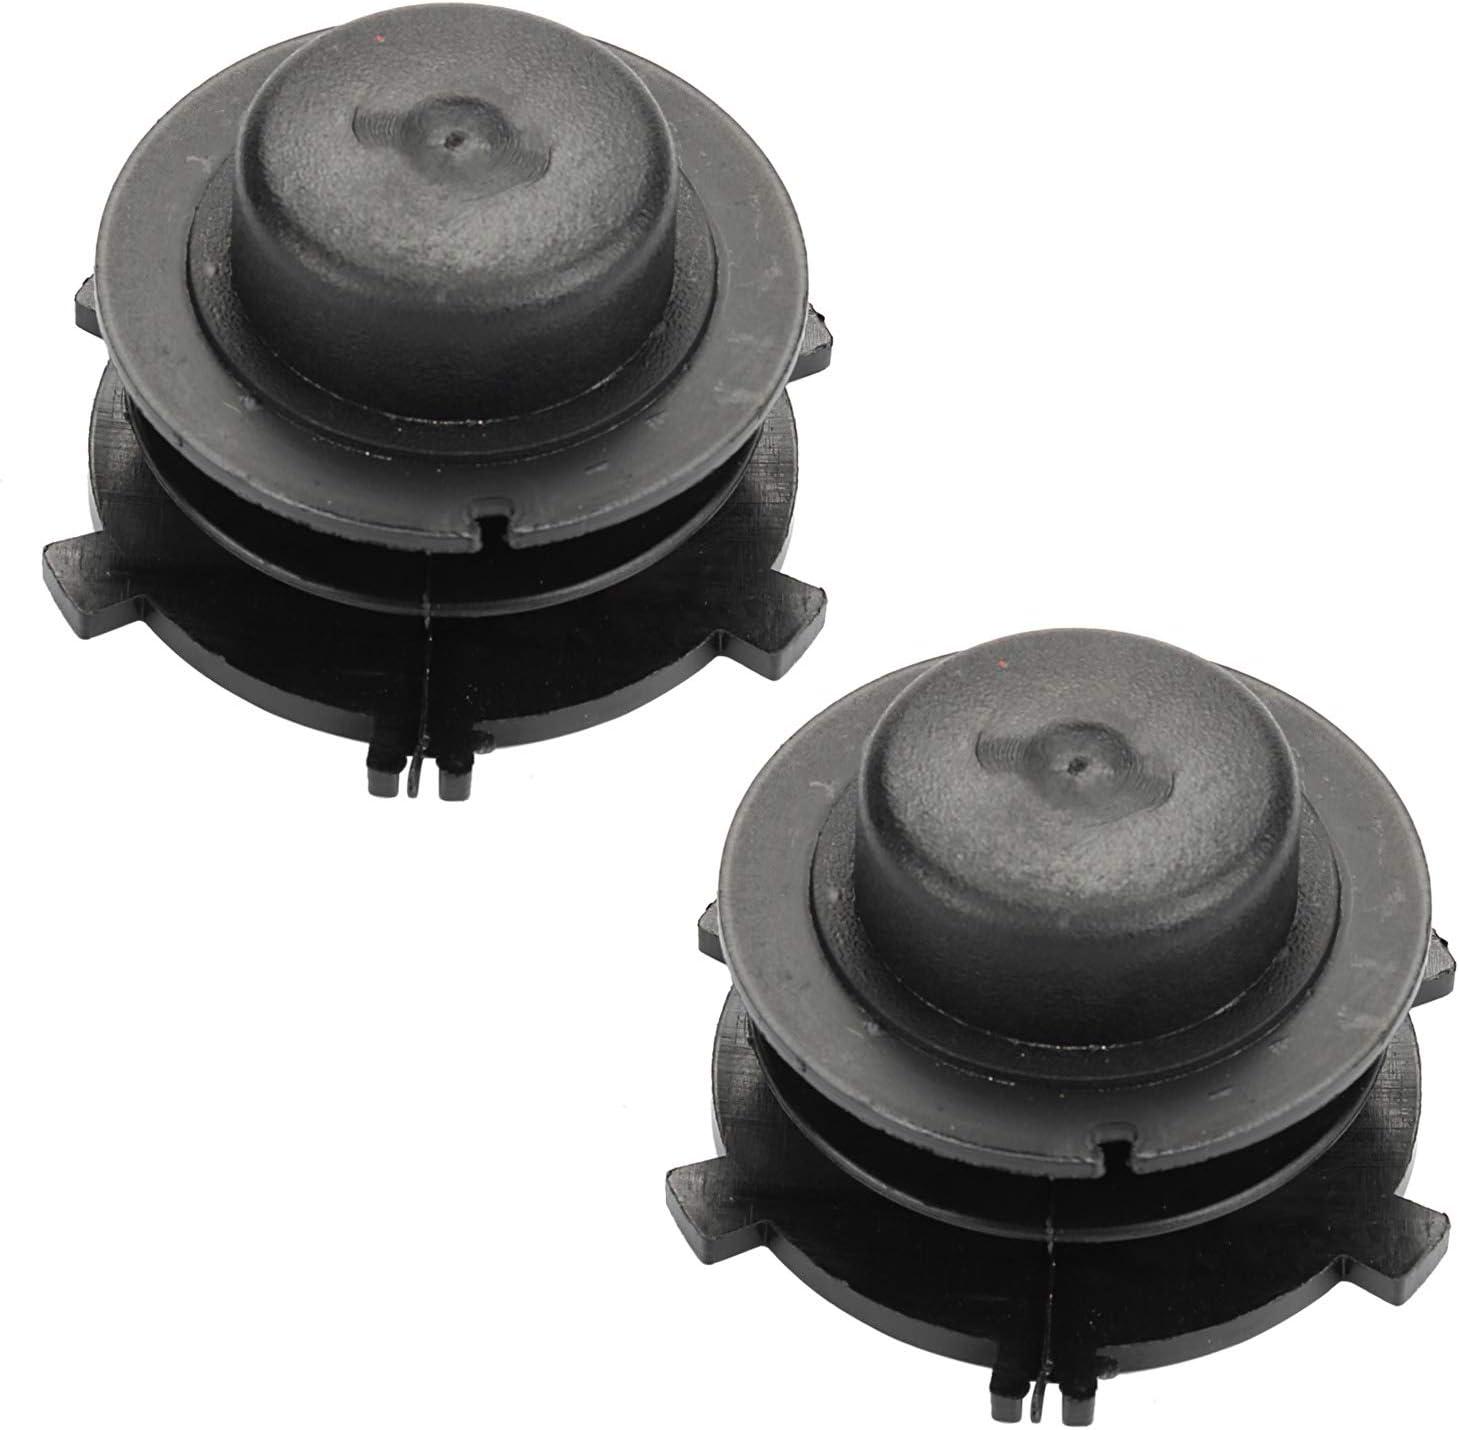 Yermax Trimmer Head Spool for Stihl Autocut 25-2 FS44 FS55 FS80 FS83 FS85 FS90 FS100 FS100RX FS110 FS120 FS130 FS200 FS250 KM55 KM85 KM90 KM110 KM130